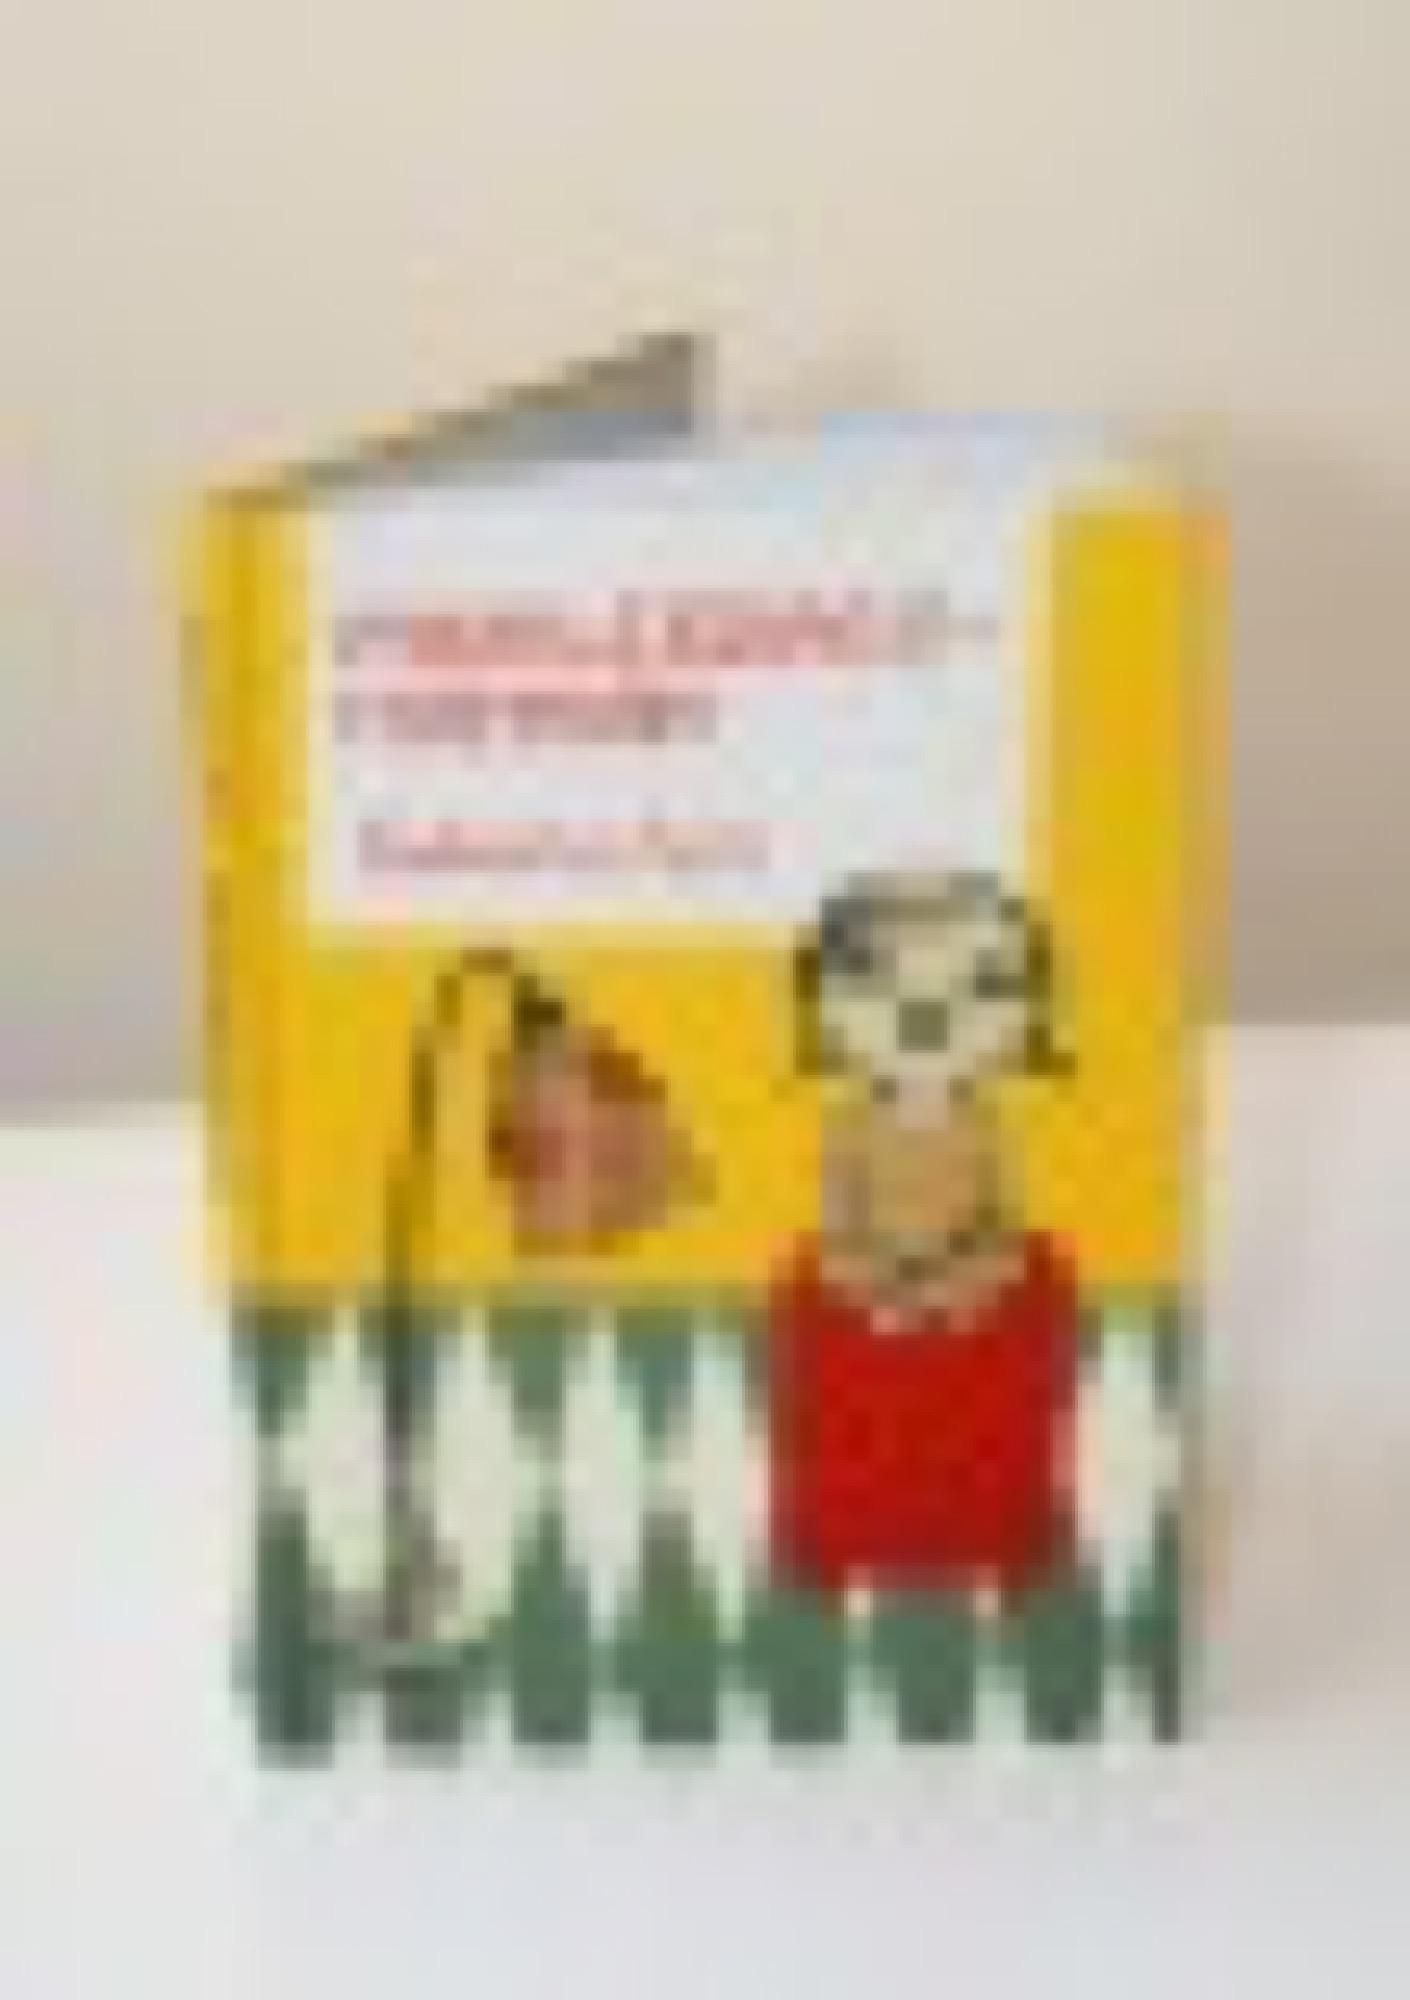 Födelsedagsmamman, childrensbook 2003